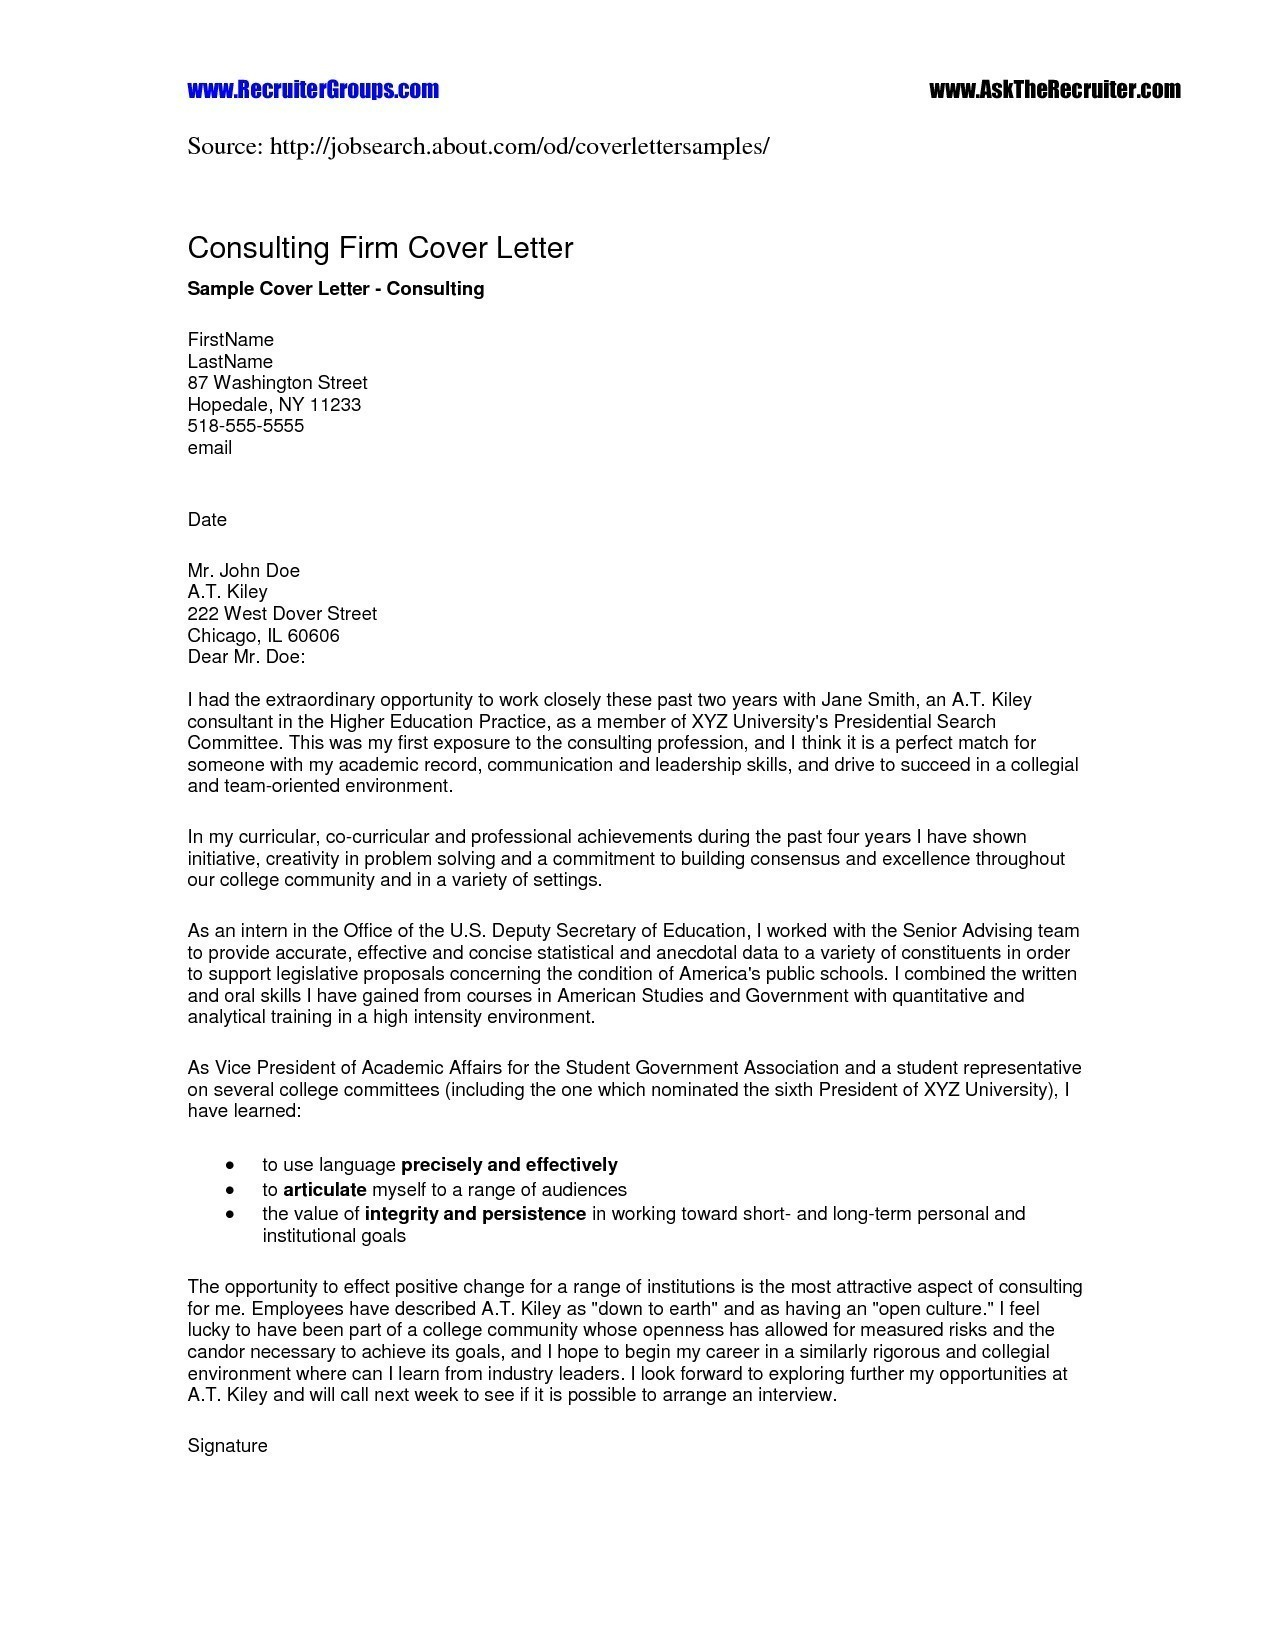 Self Employment Verification Letter Template - Sample Job Verification Letter Refrence Job Application Letter